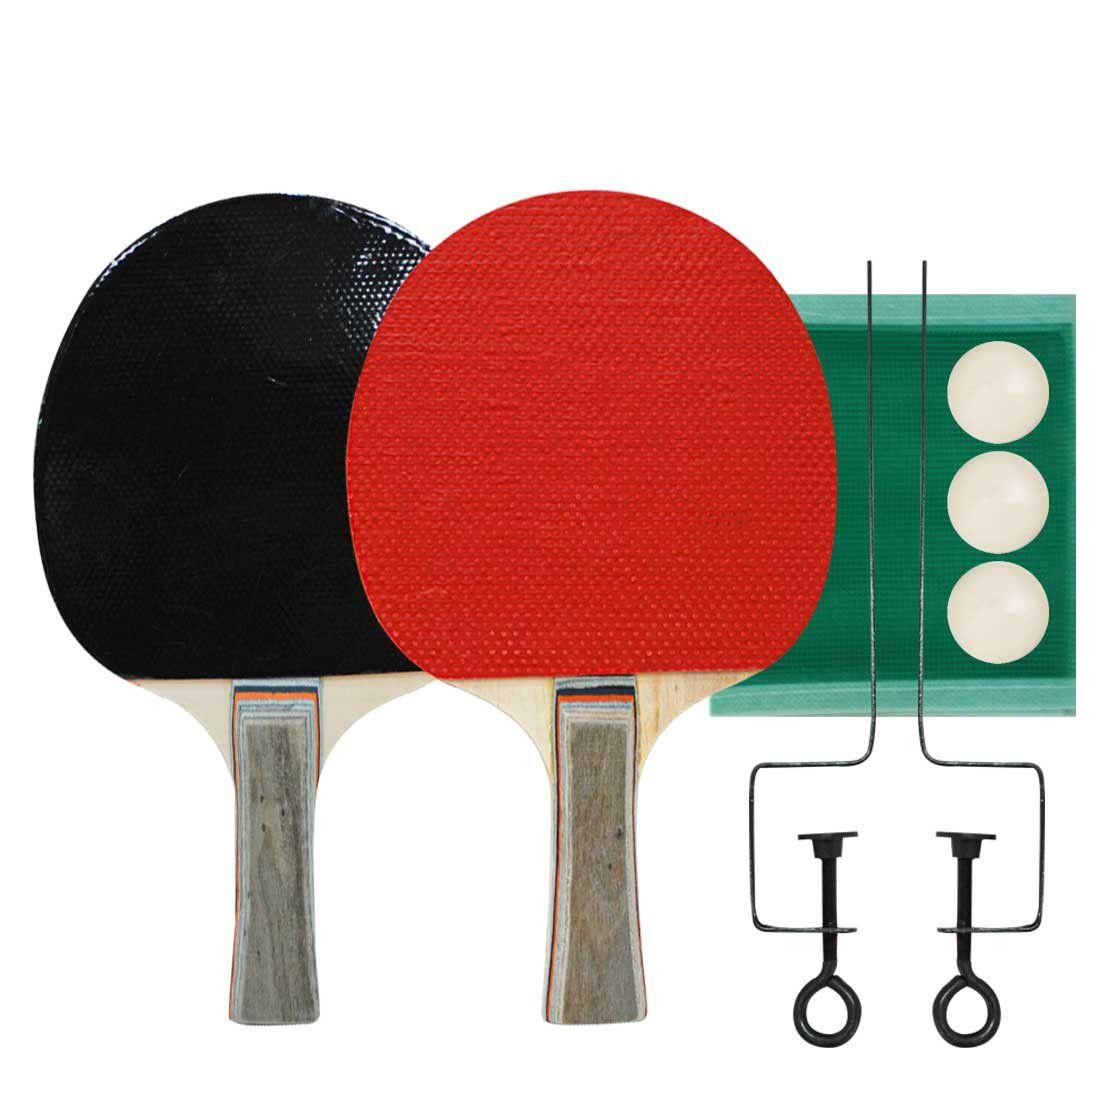 Kit 2 Raquetes Tenis de Mesa Ping Pong + 3 Bolas + Rede + Suporte - Convoy - YS38030